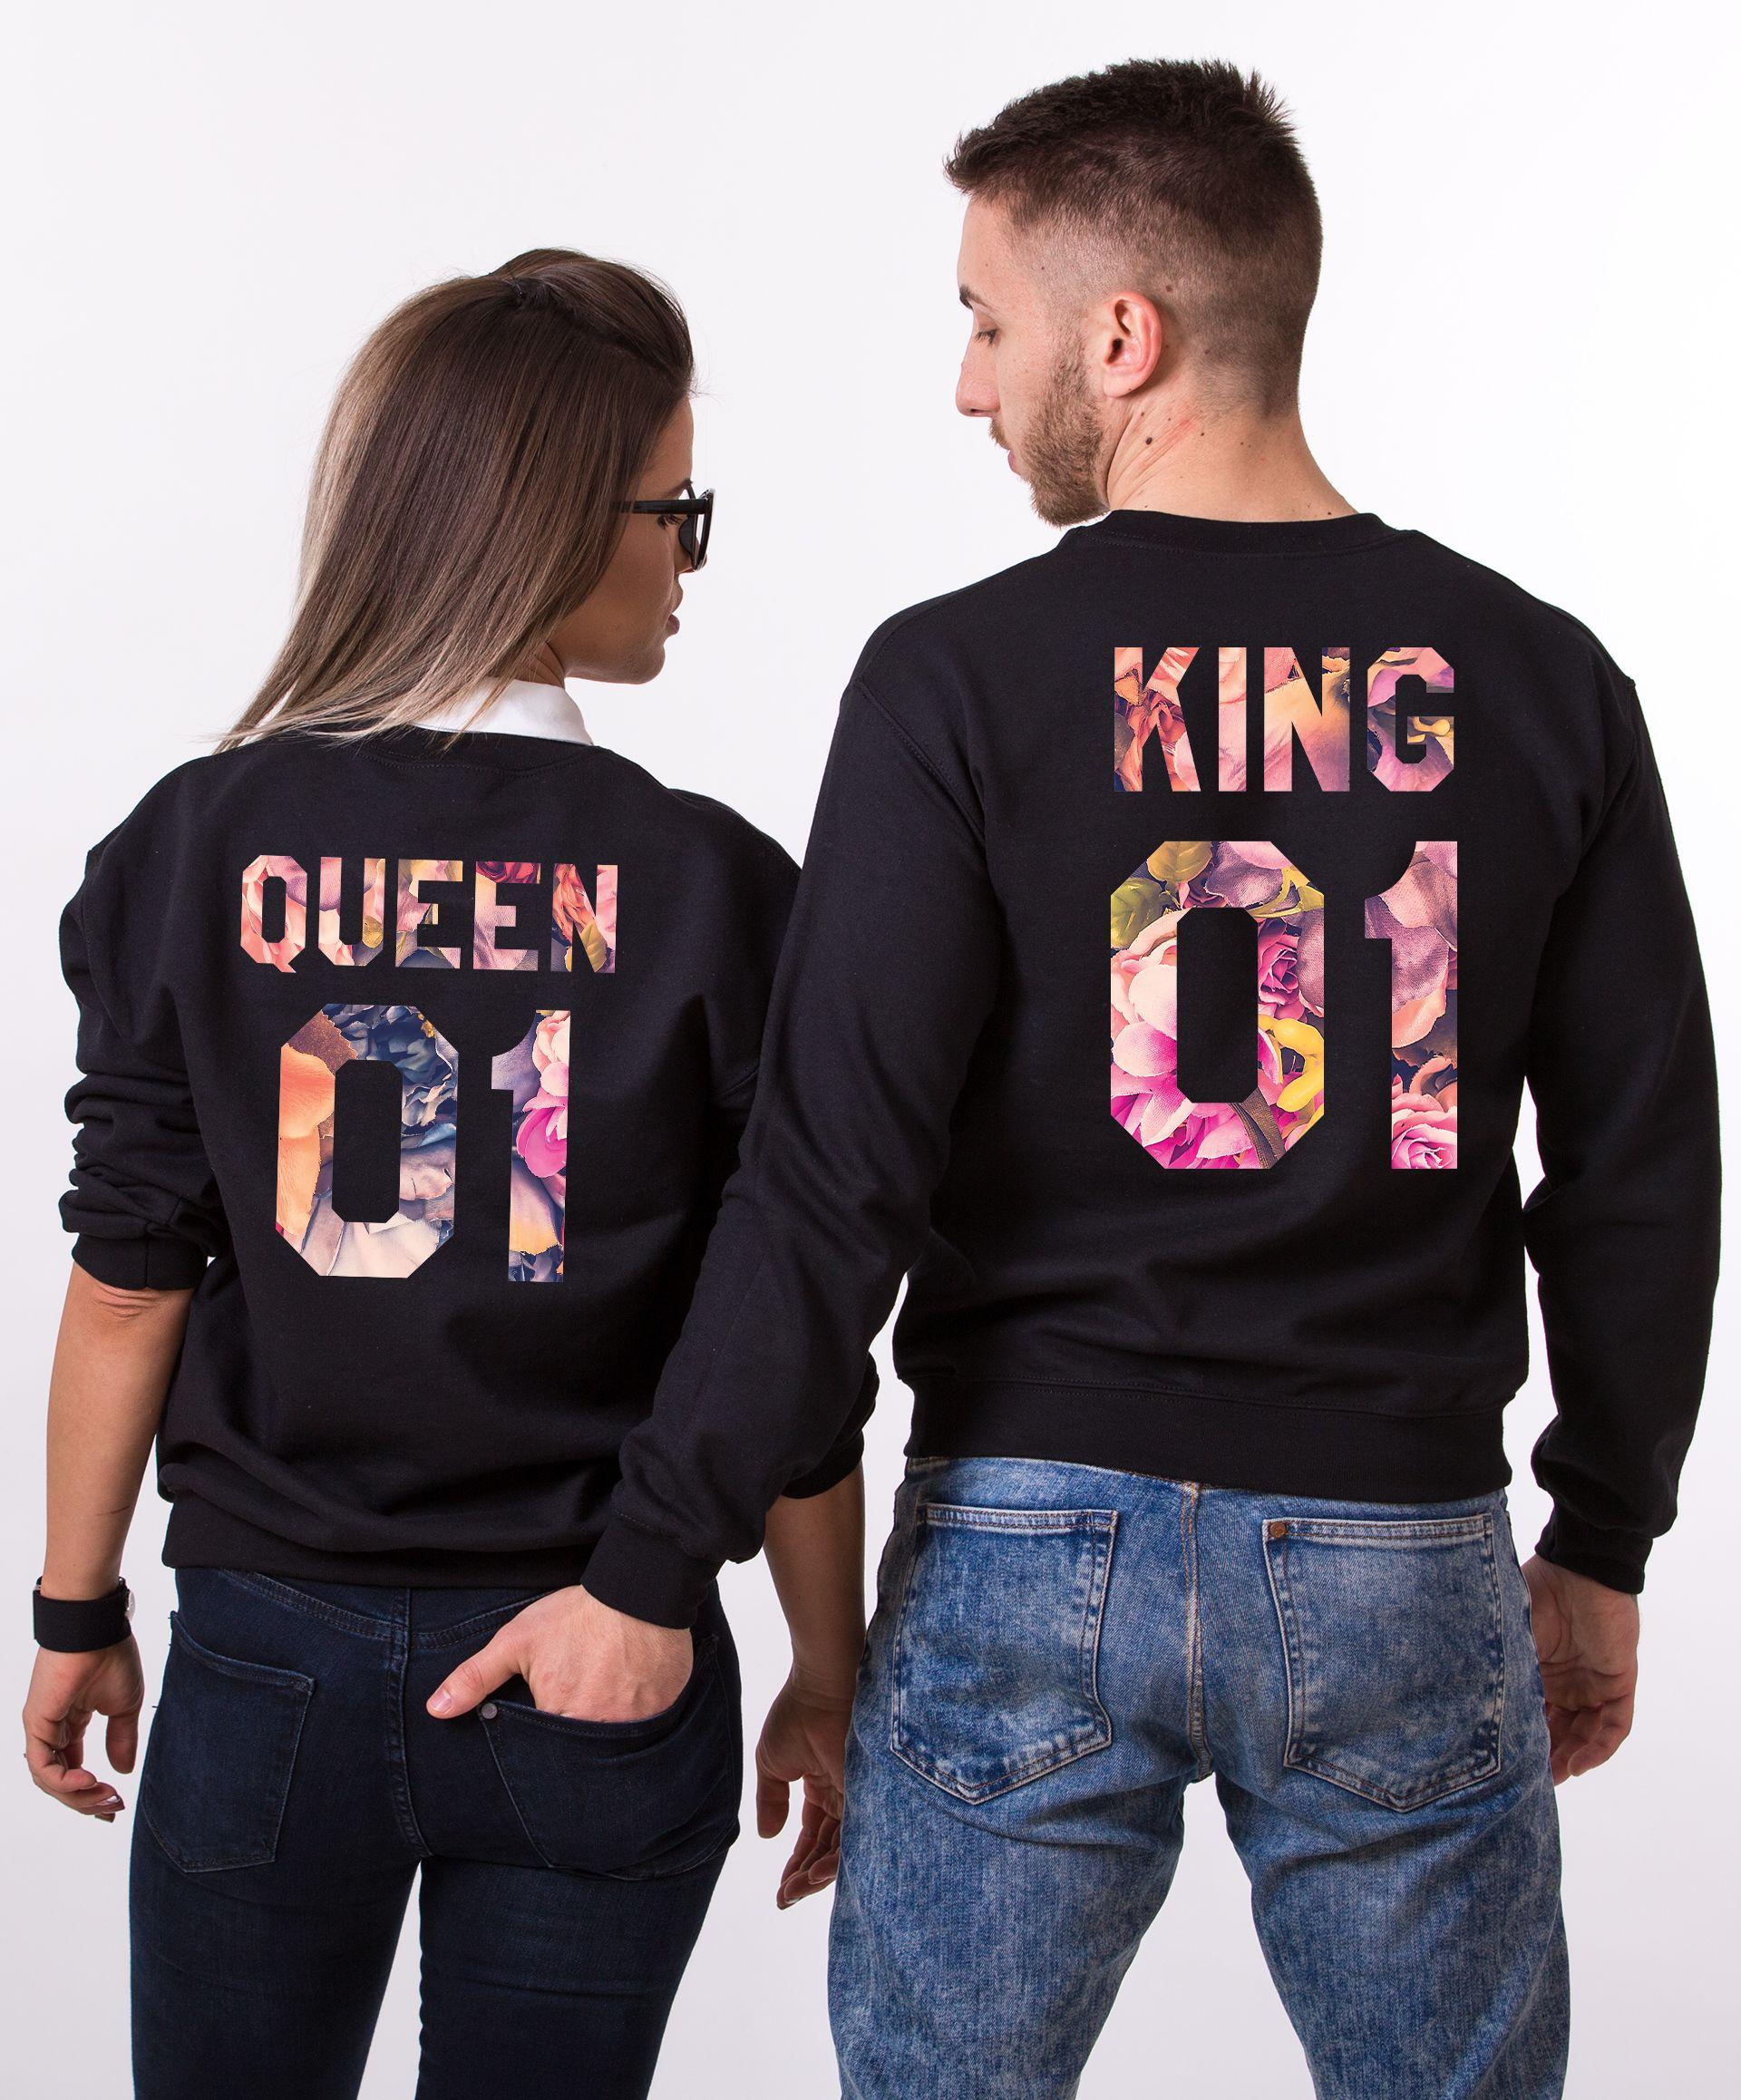 Fleur Collection, King Queen Flower, Floral King Queen Shirts, Shirts for Couples, Fleur King Shirt, Fleur Queen Shirt, UNISEX